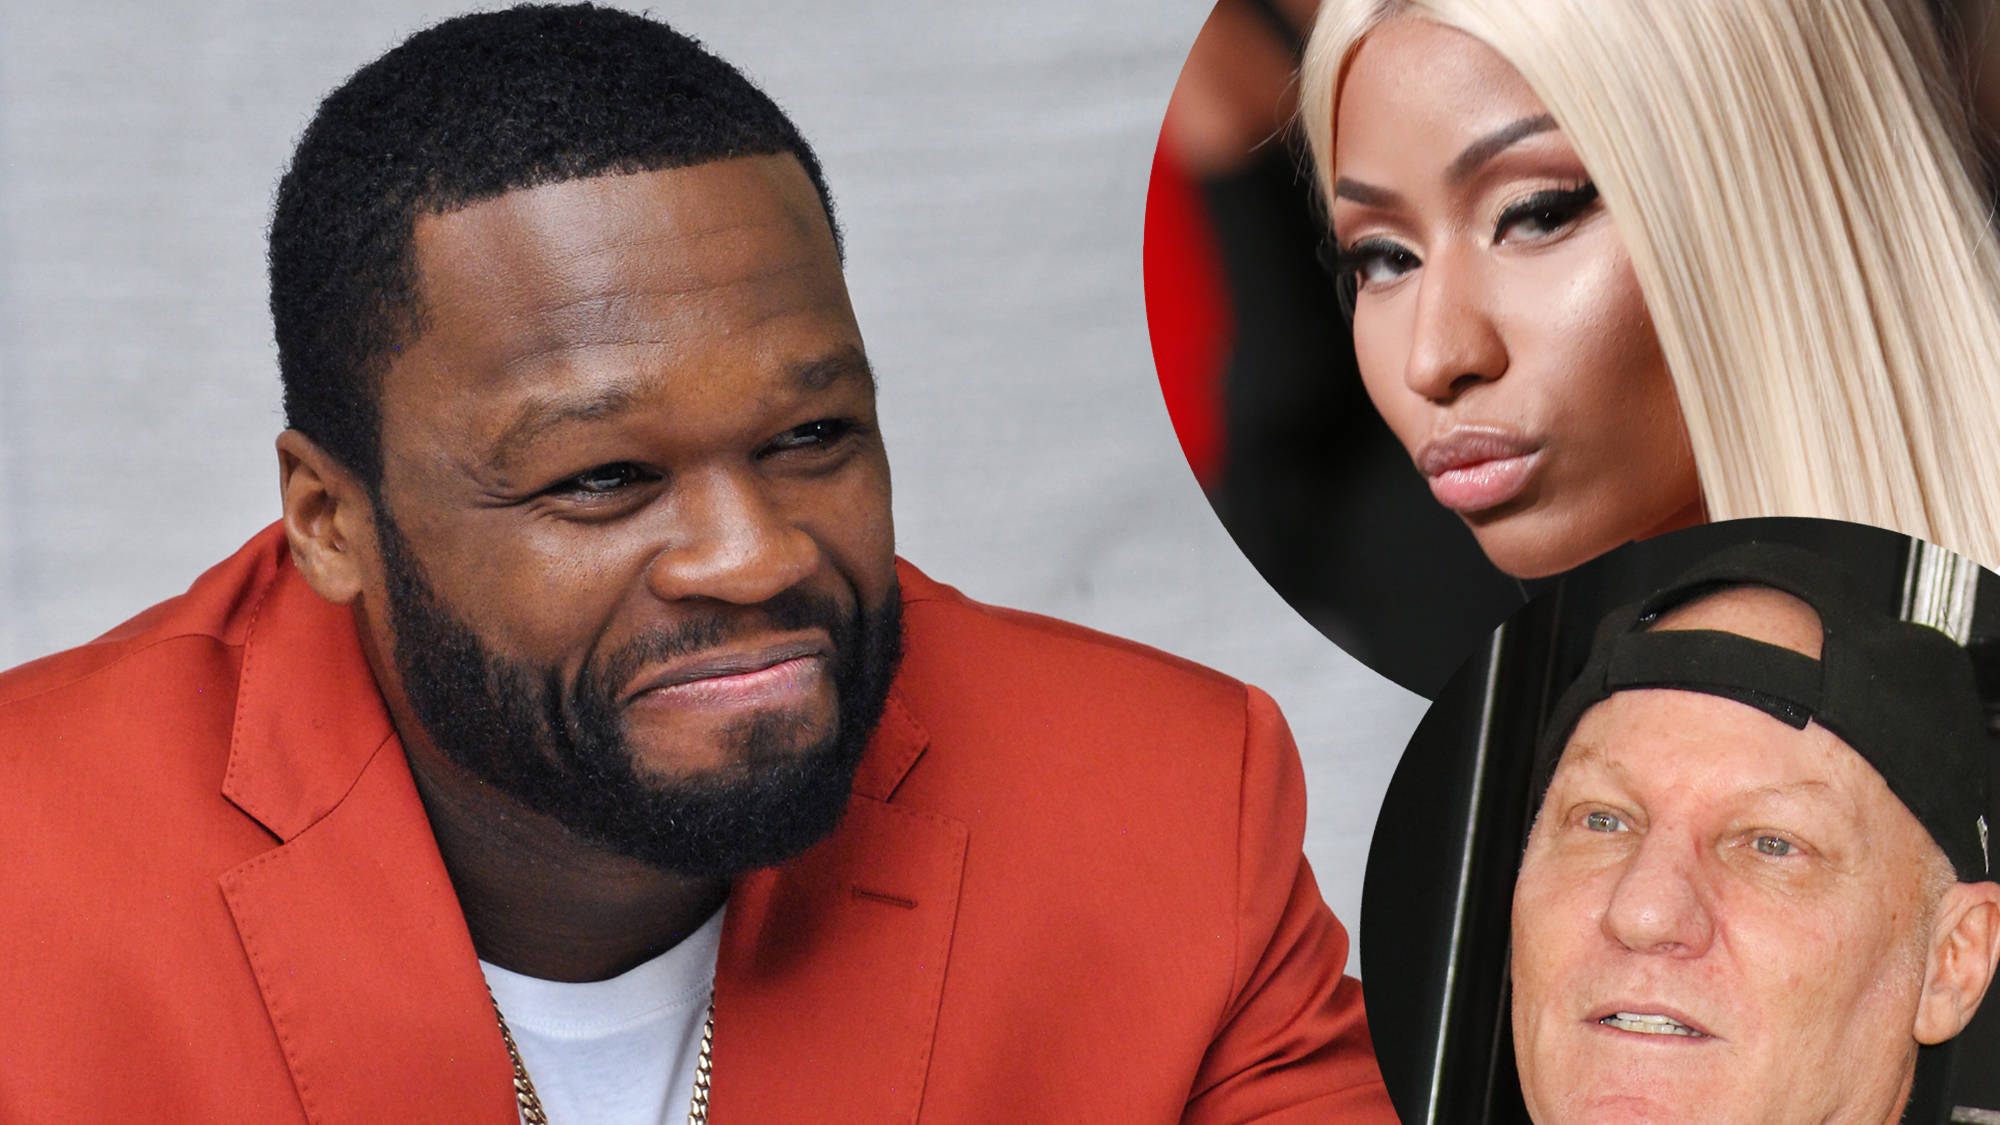 339141608ec 50 Cent Reacts To Nicki Minaj's Beef With Steve Madden - Capital XTRA